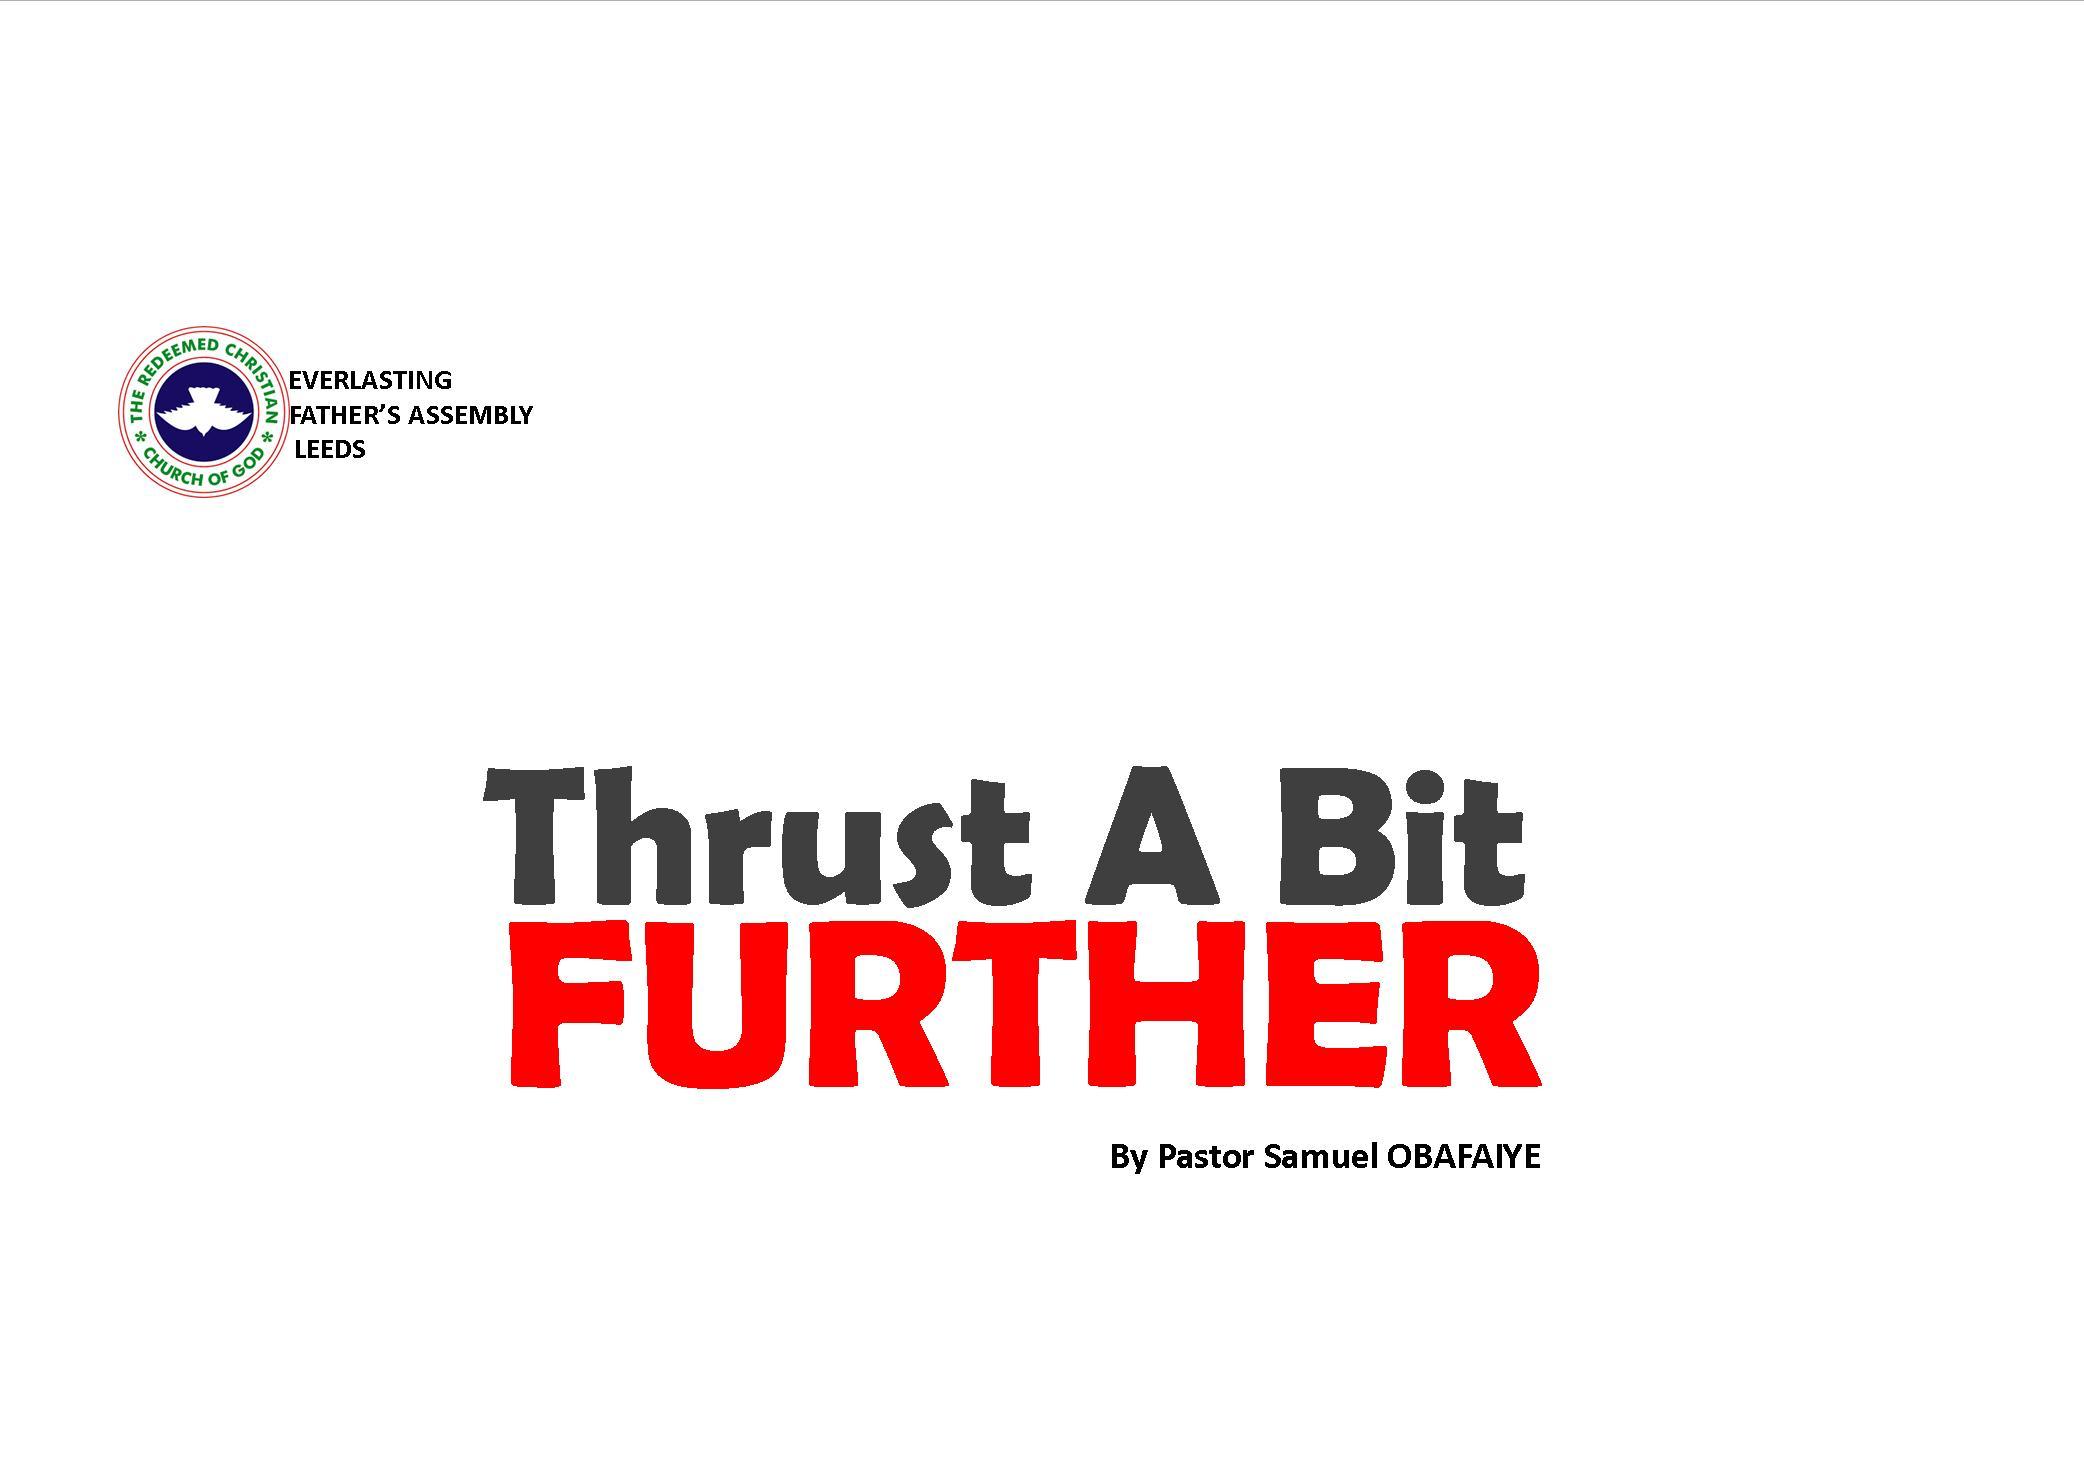 Thrust A Bit Further, by Pastor Samuel Obafaiye